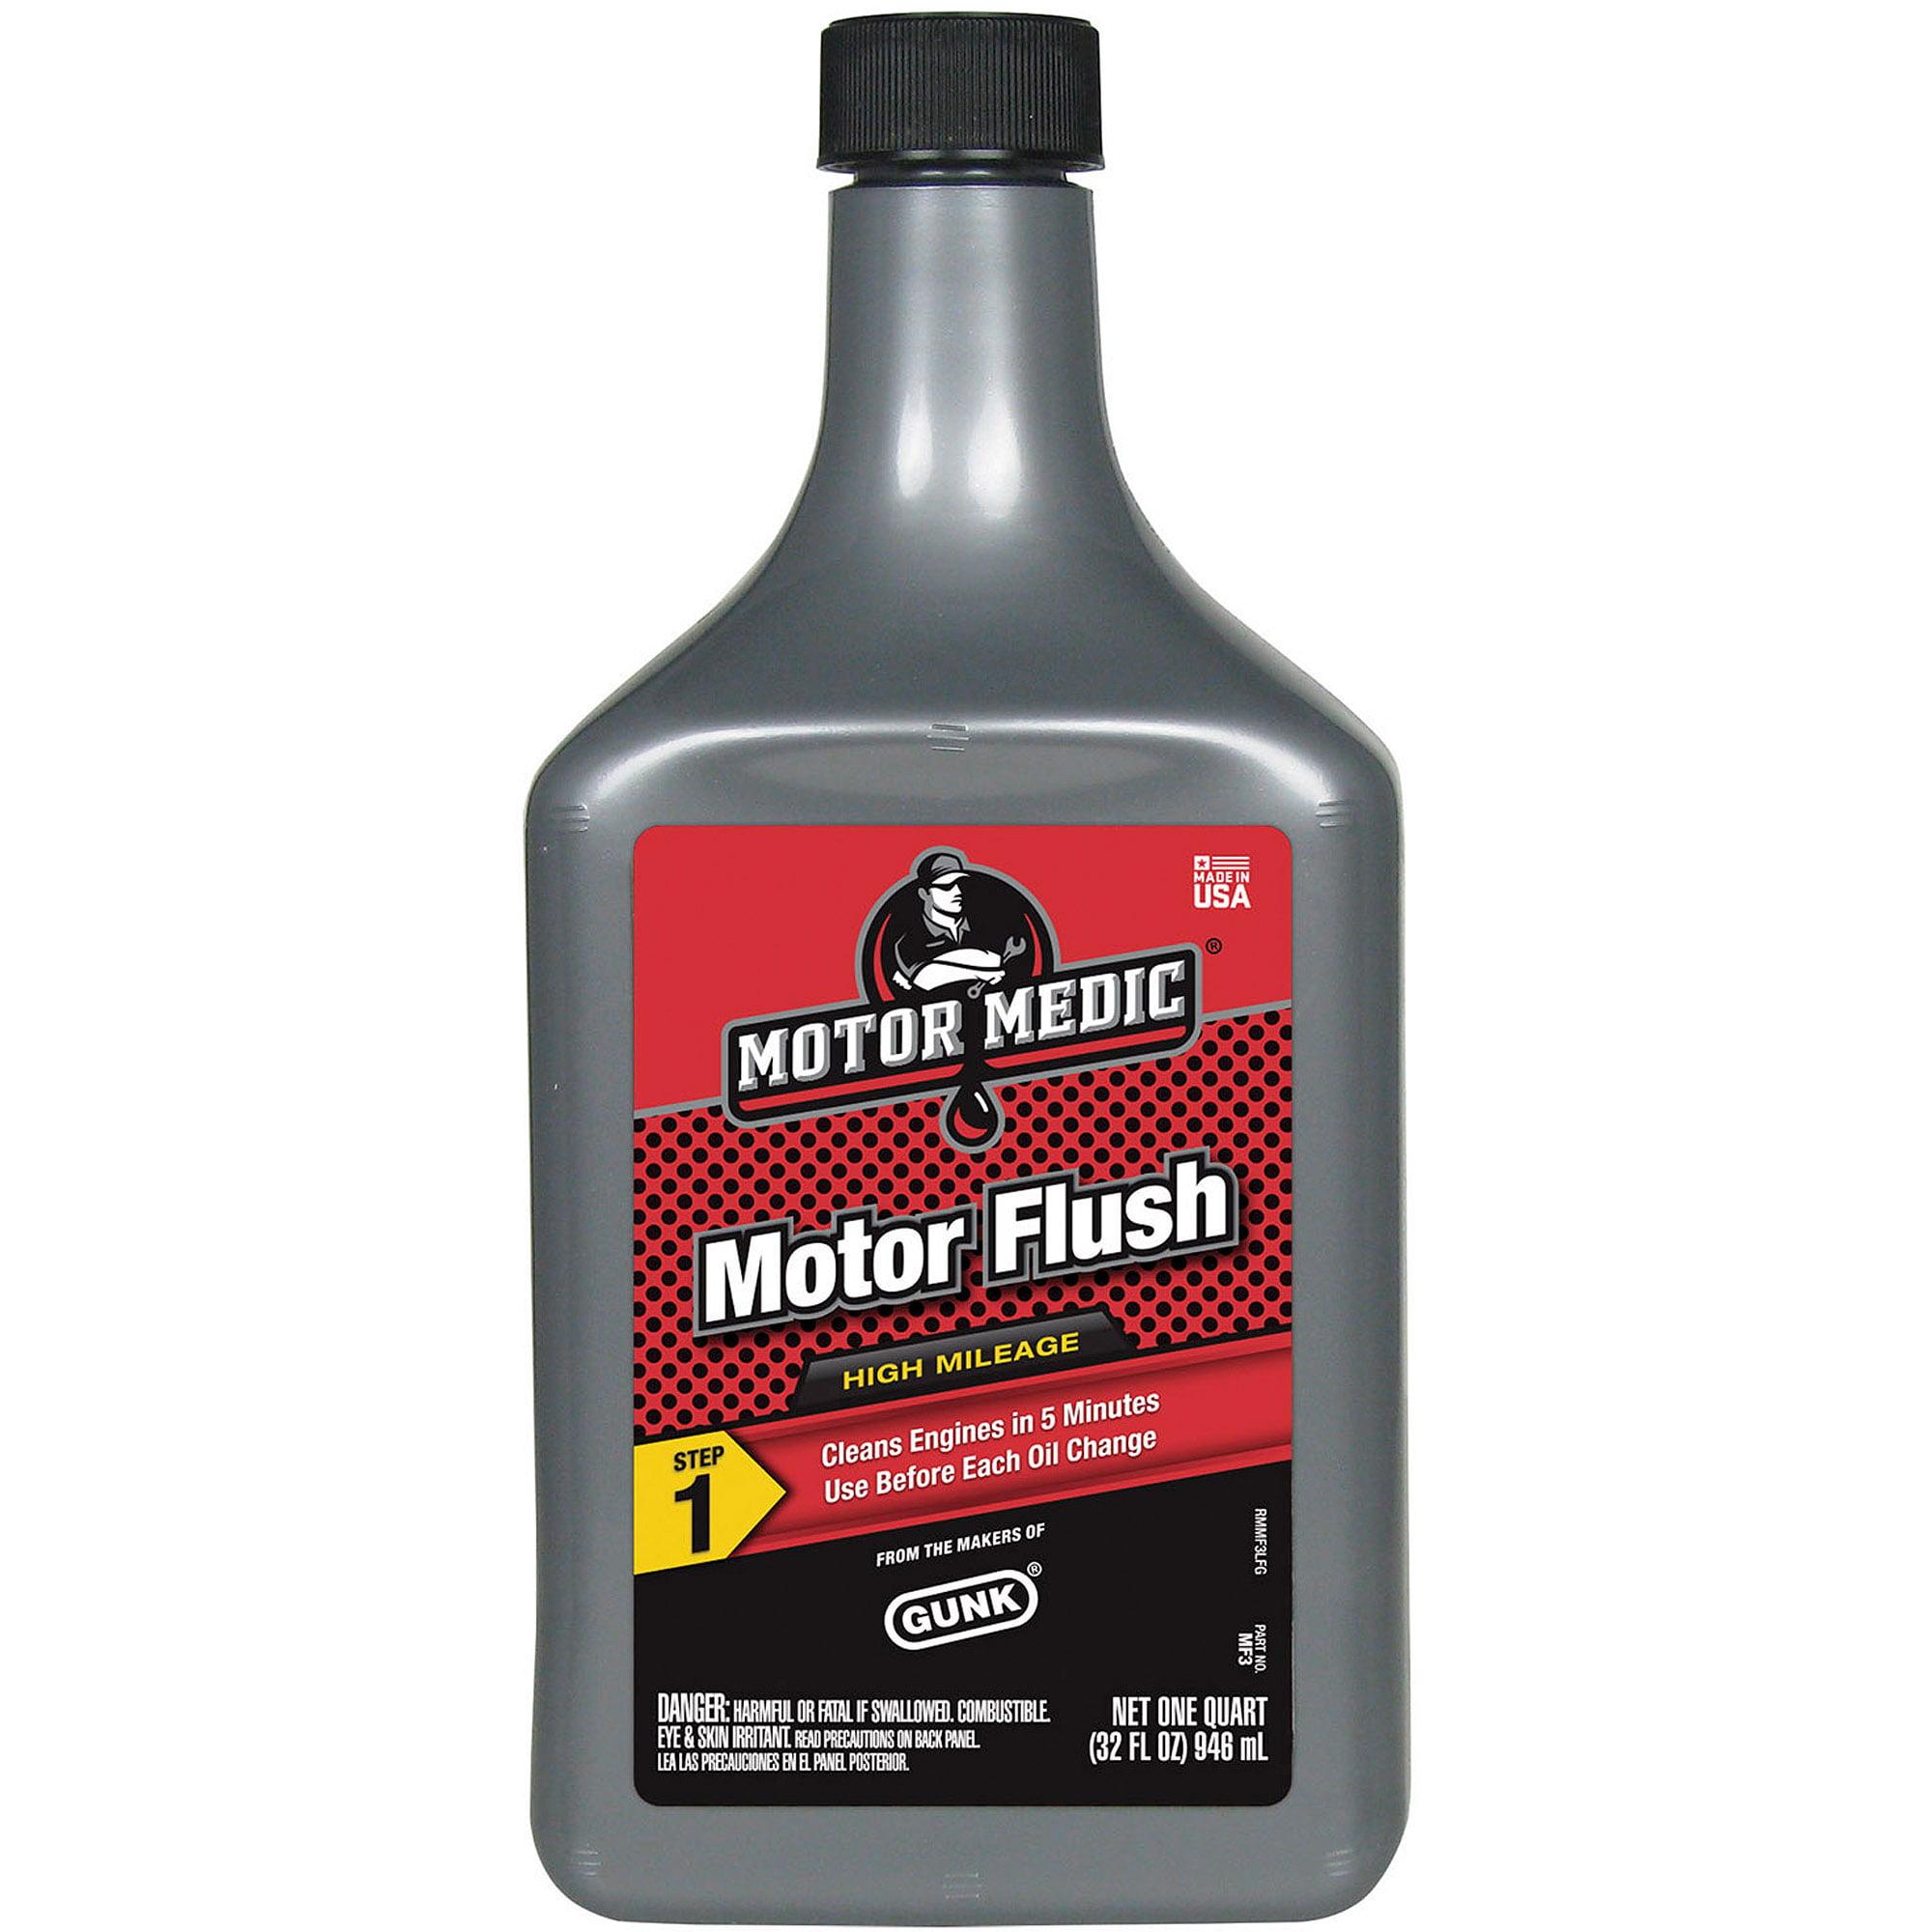 Motor Medic 5-Minute Motor Flush, 32 oz